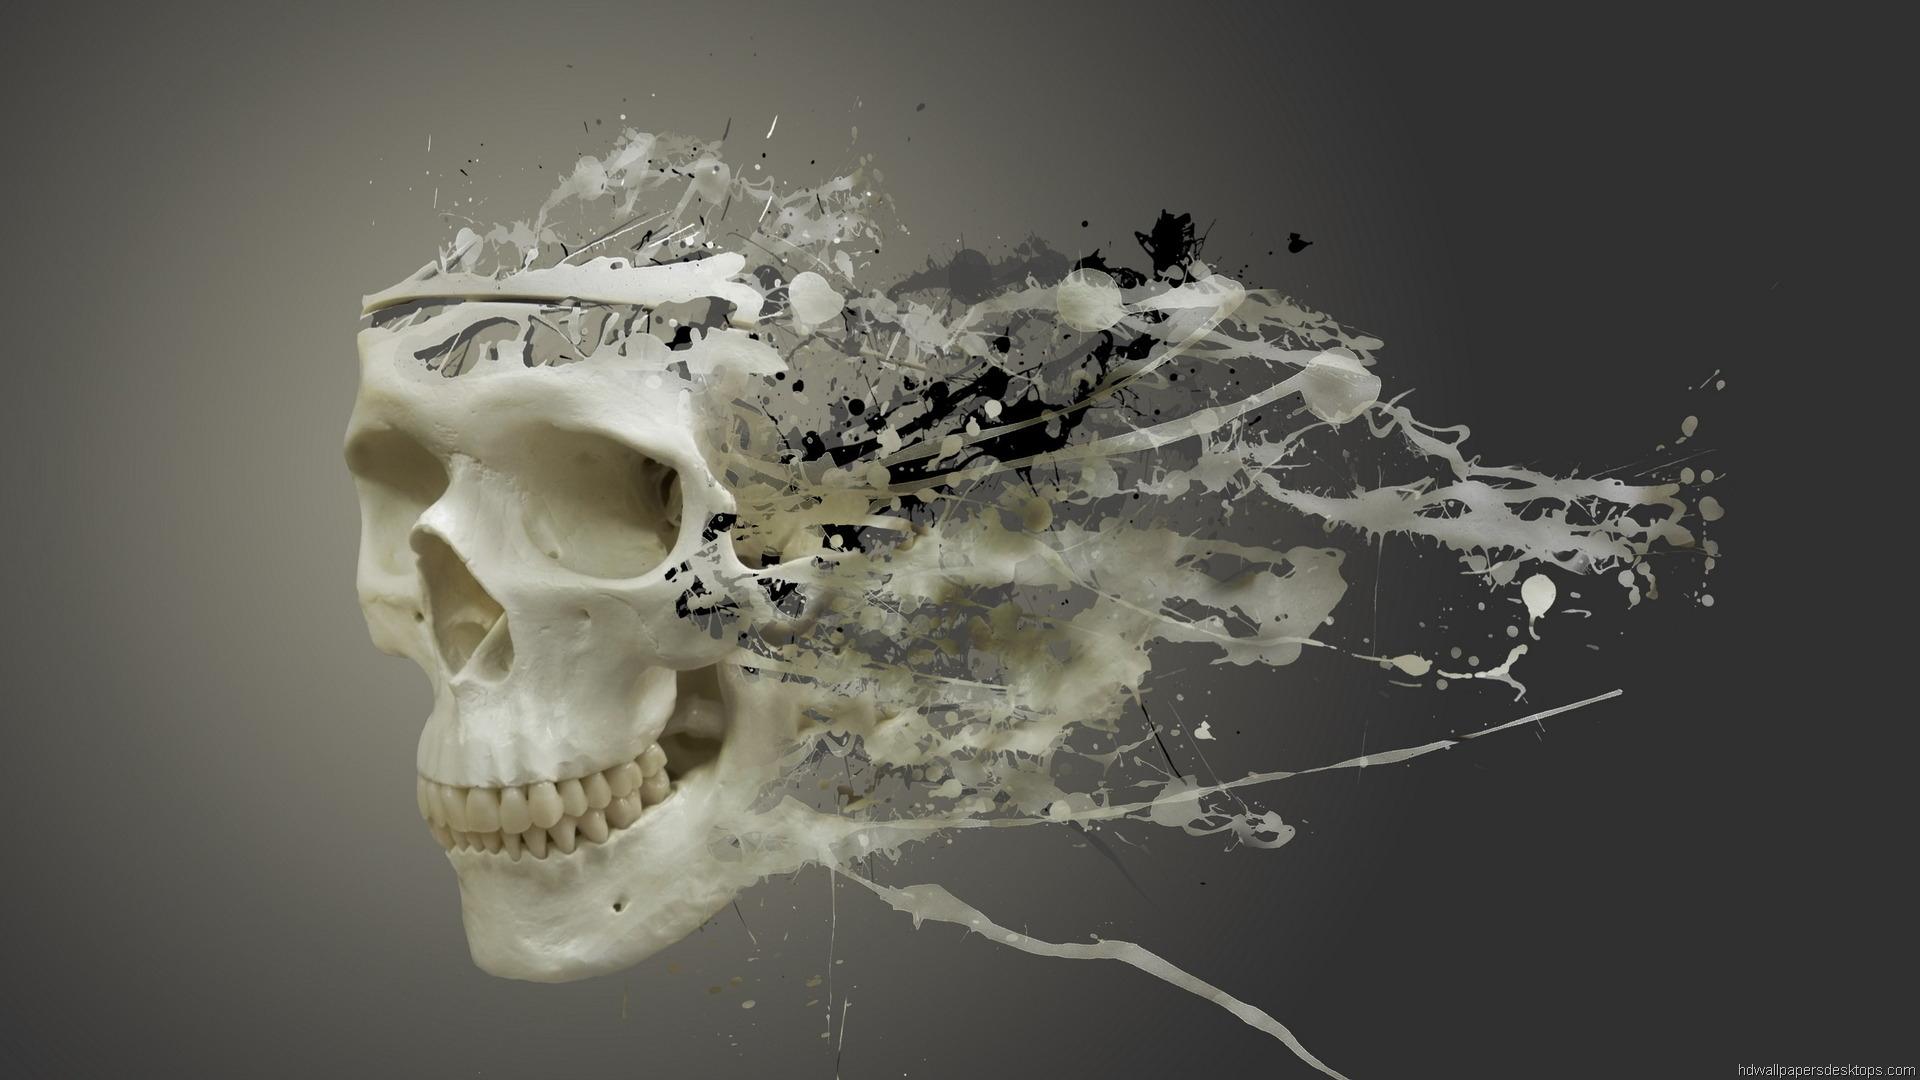 Skull 3d Wallpaper: 3D HD 1920x1080 Desktop Wallpapers